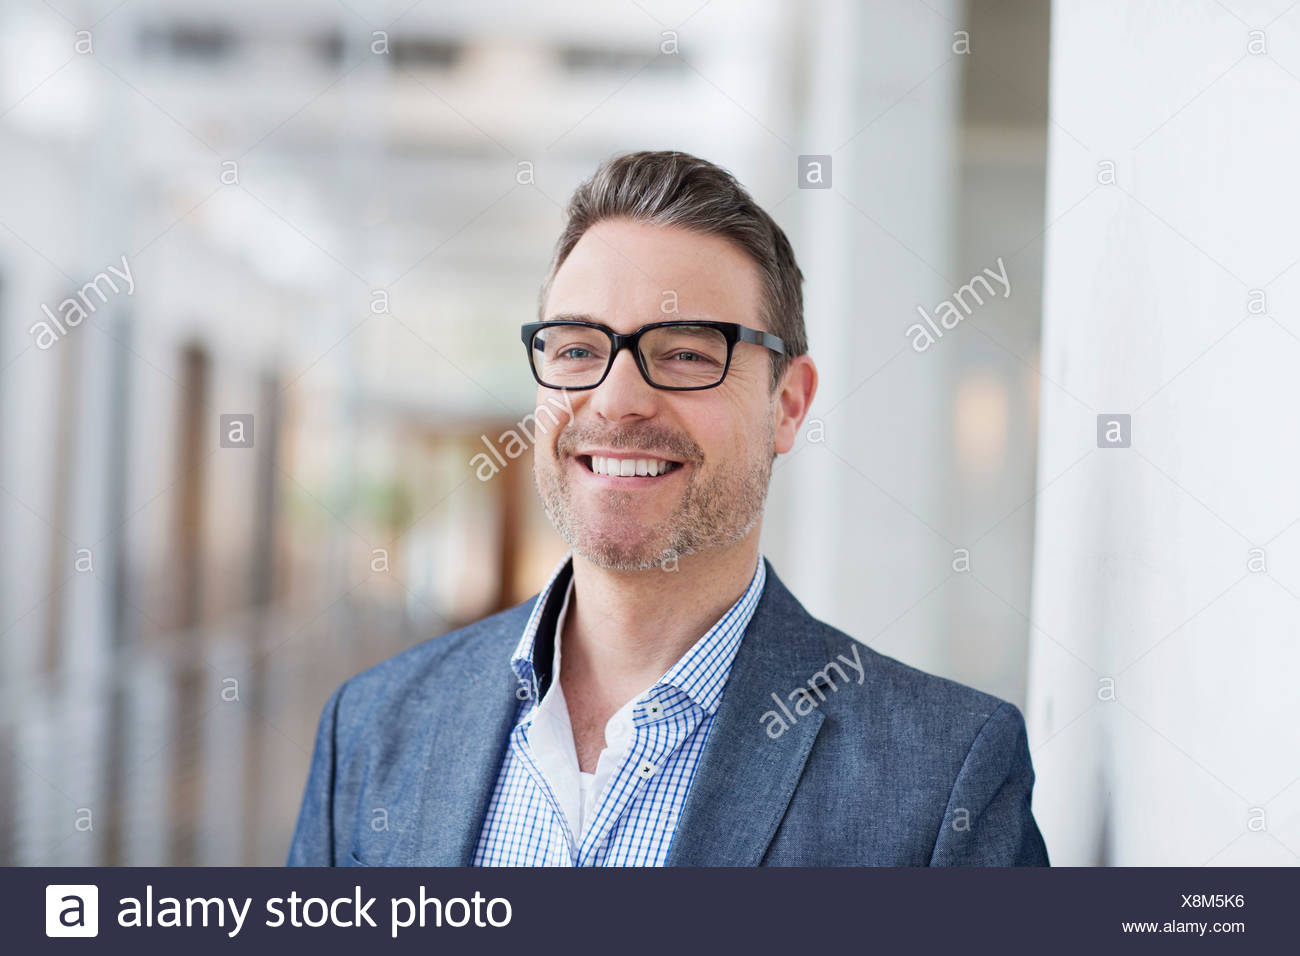 Hombre con gran sonrisa Imagen De Stock